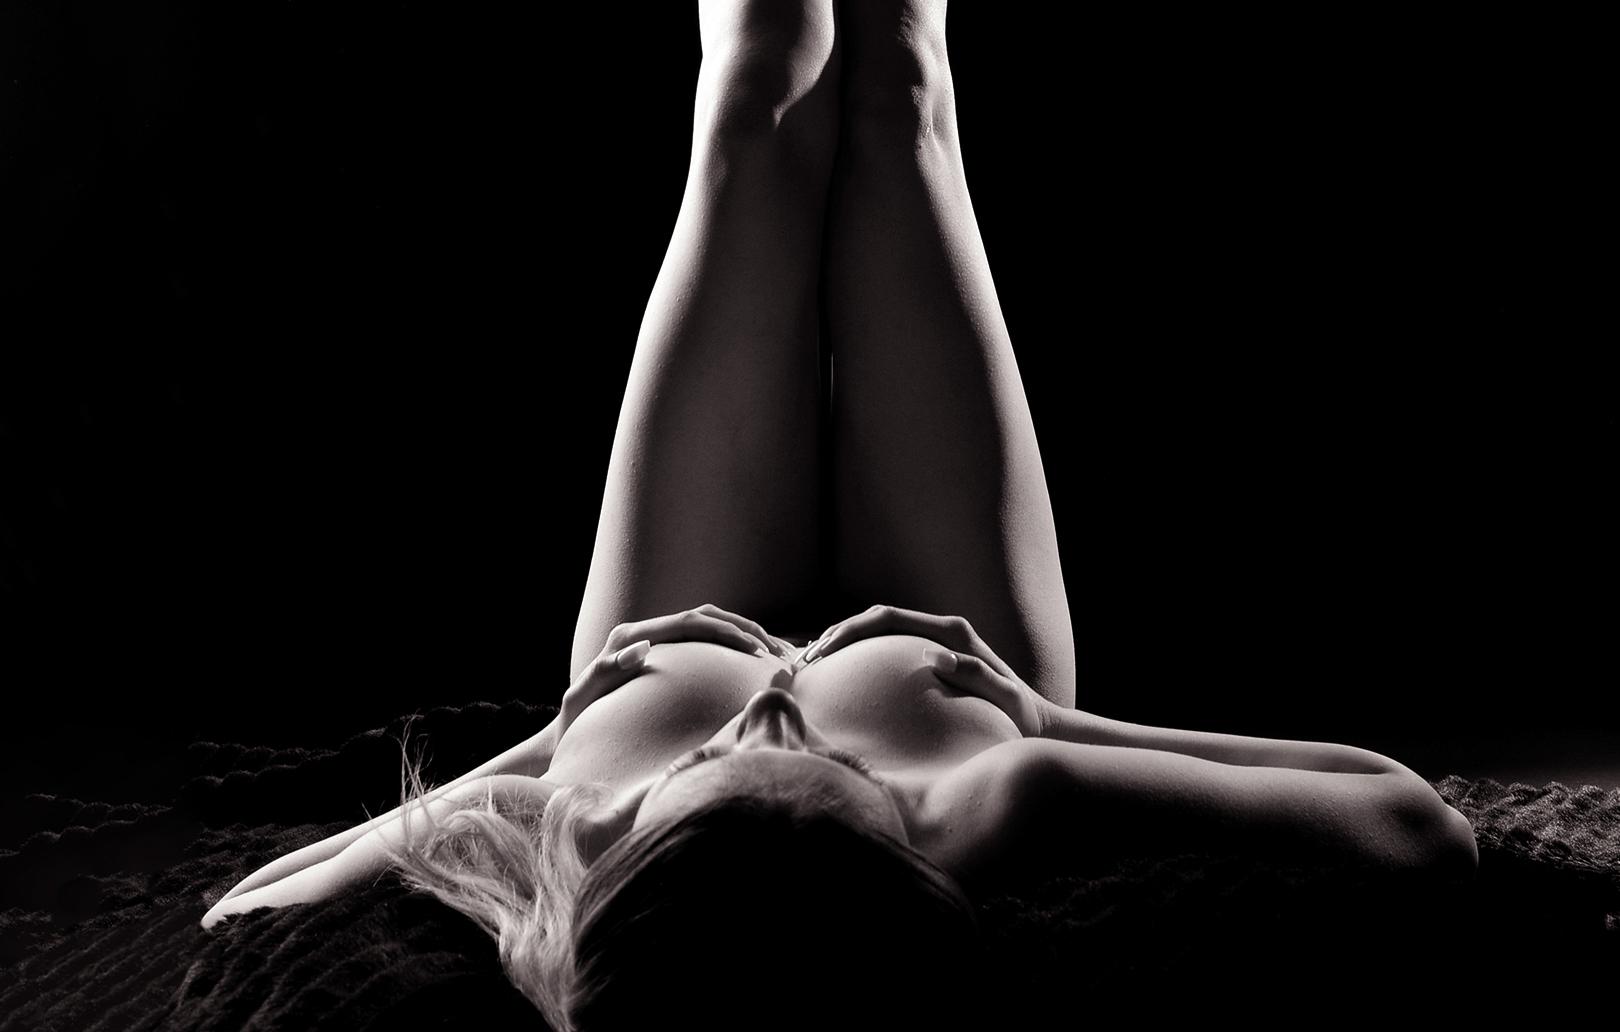 erotisches-fotoshooting-bremen-bg31610459705